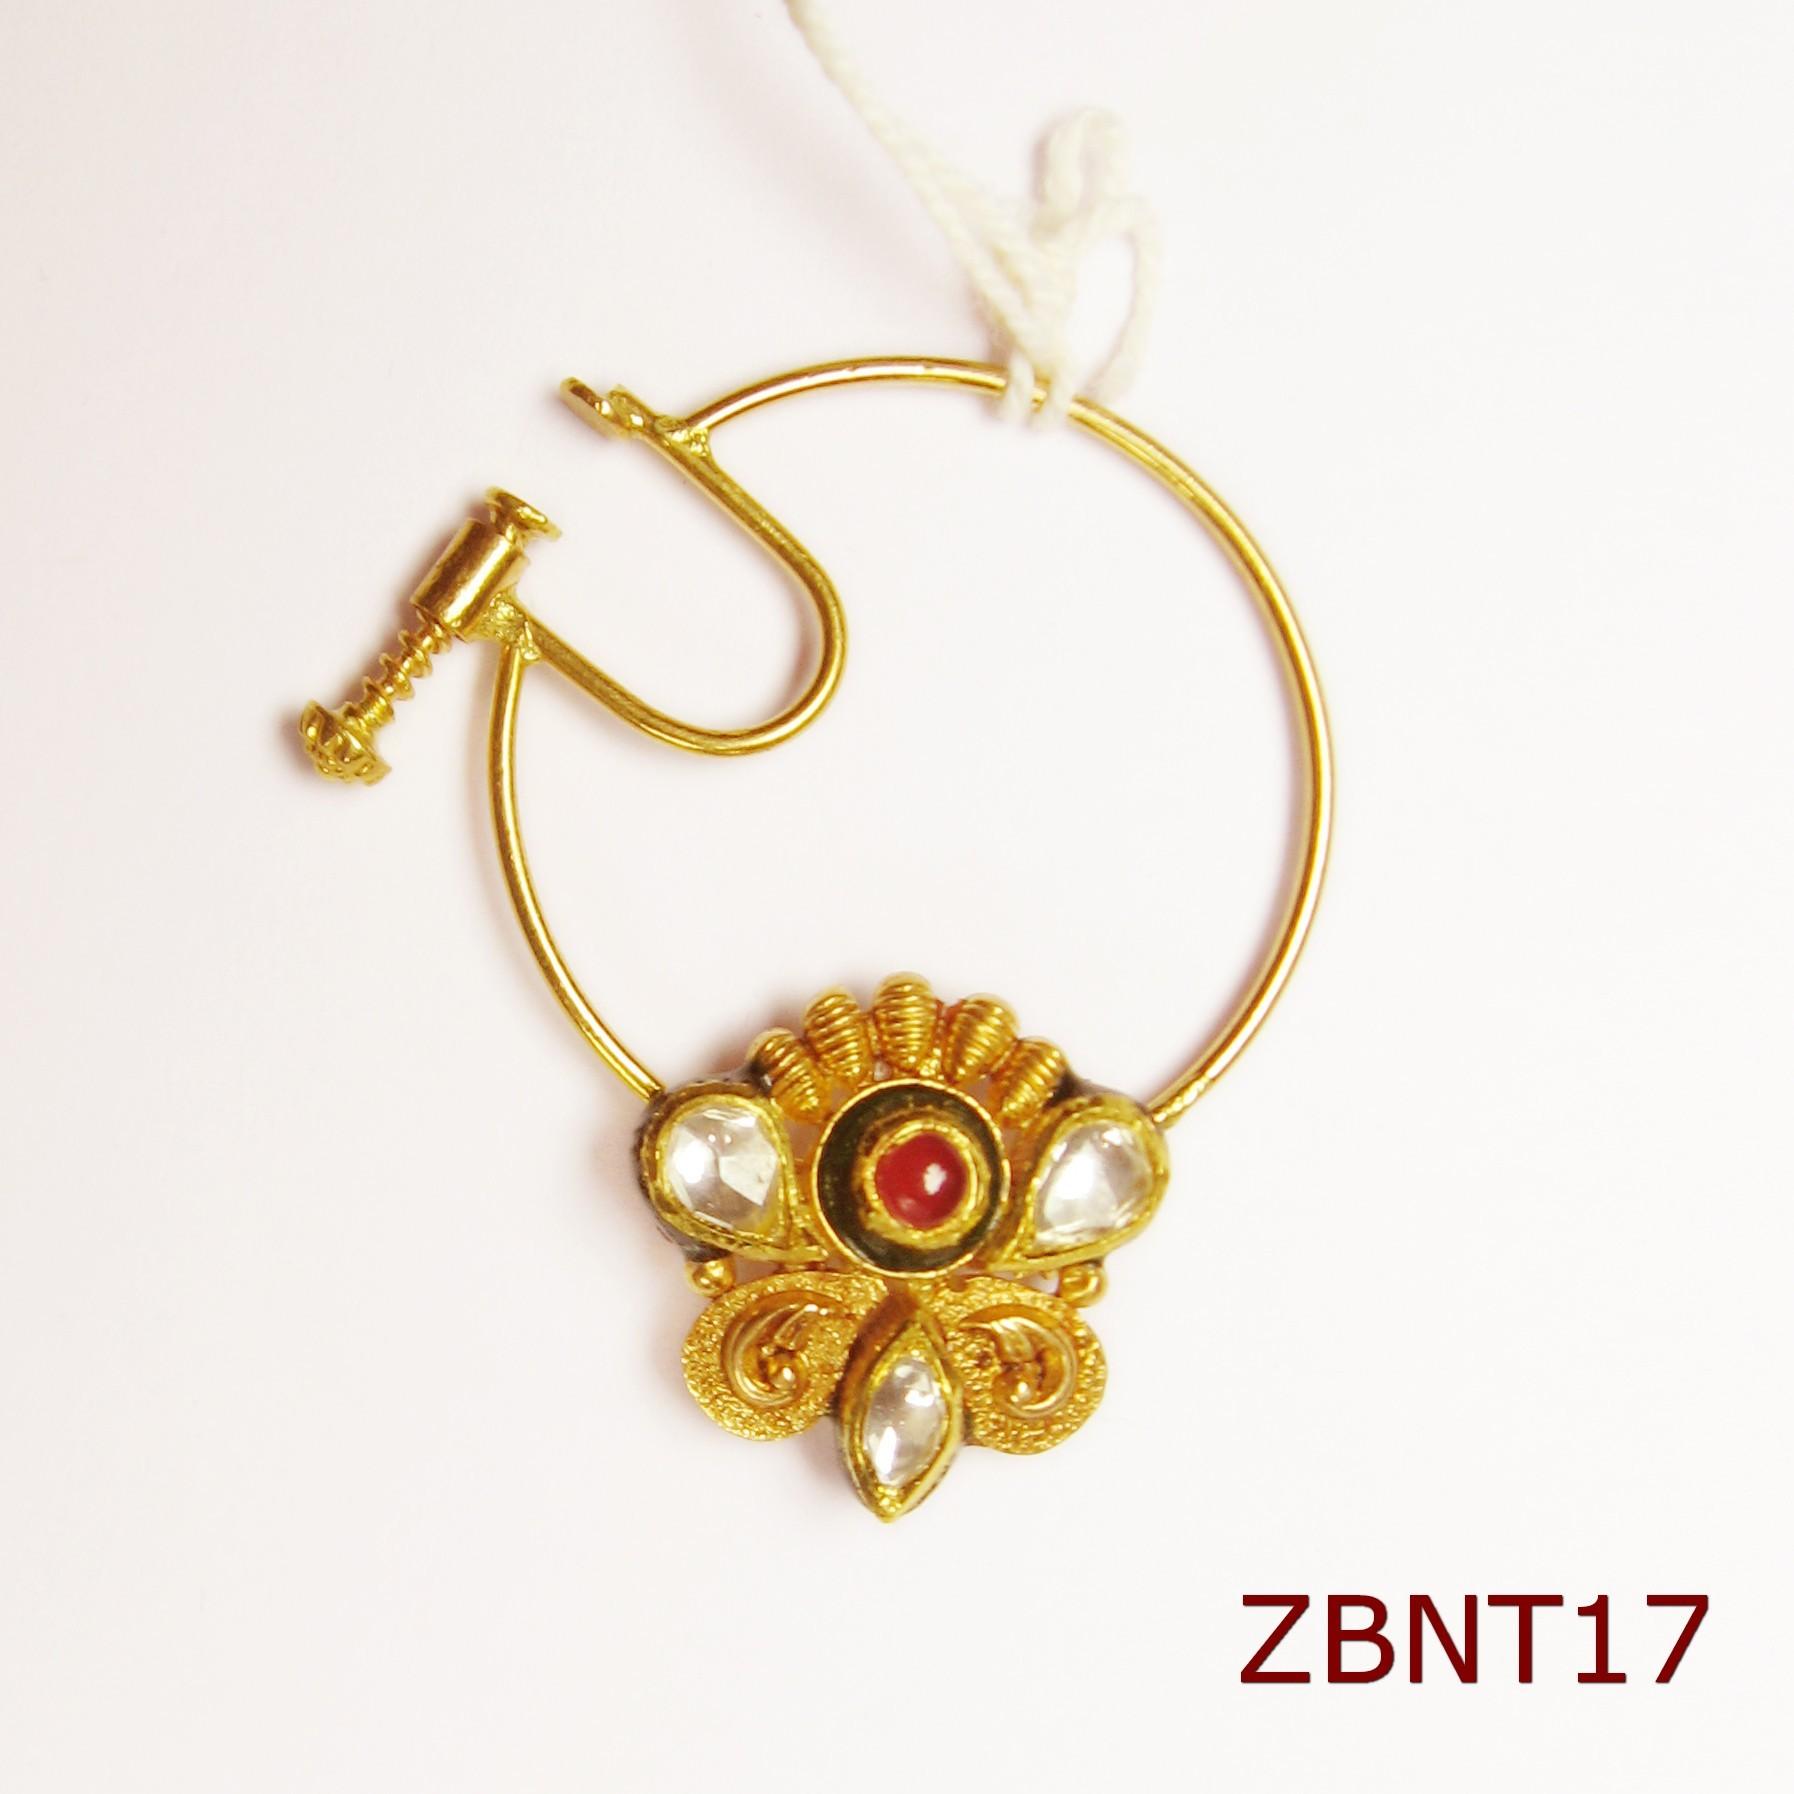 ZBNT17